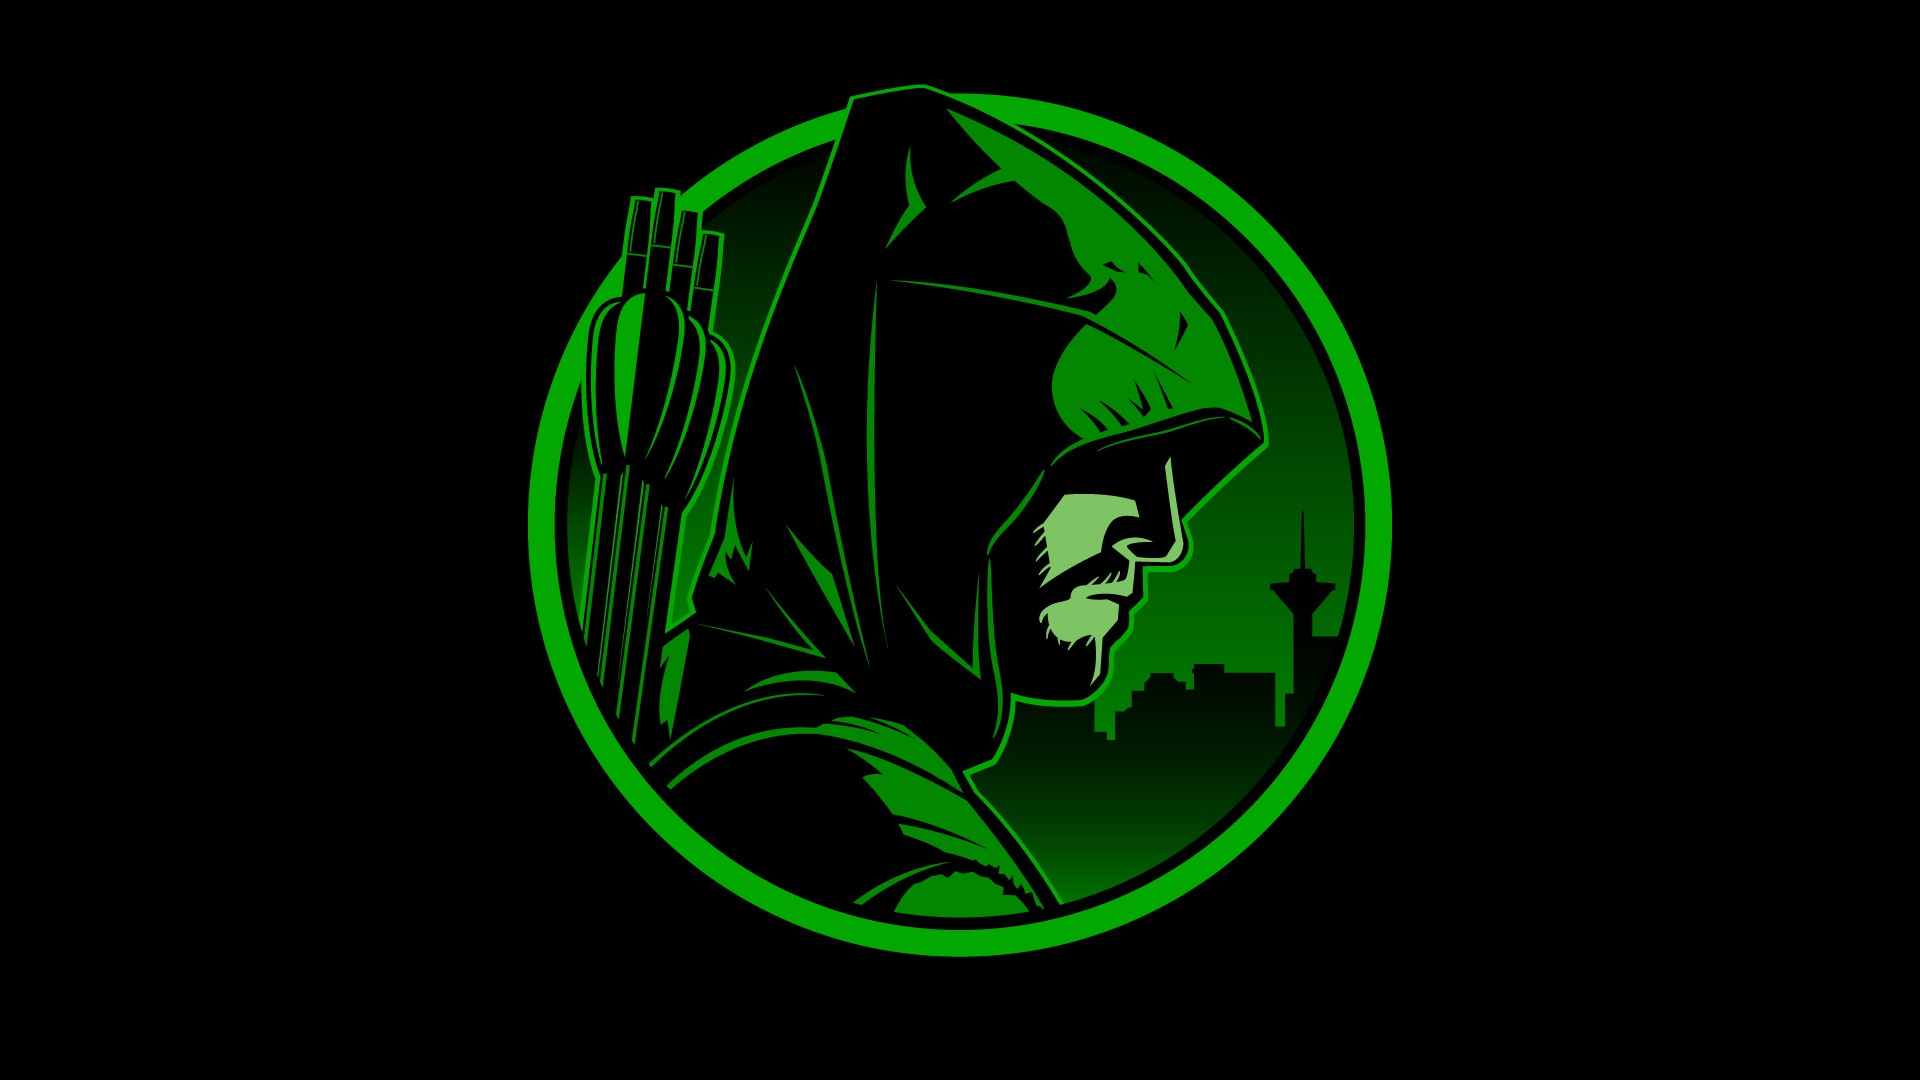 Çizgi Roman - Arrow  Arrow (Comics) Duvarkağıdı